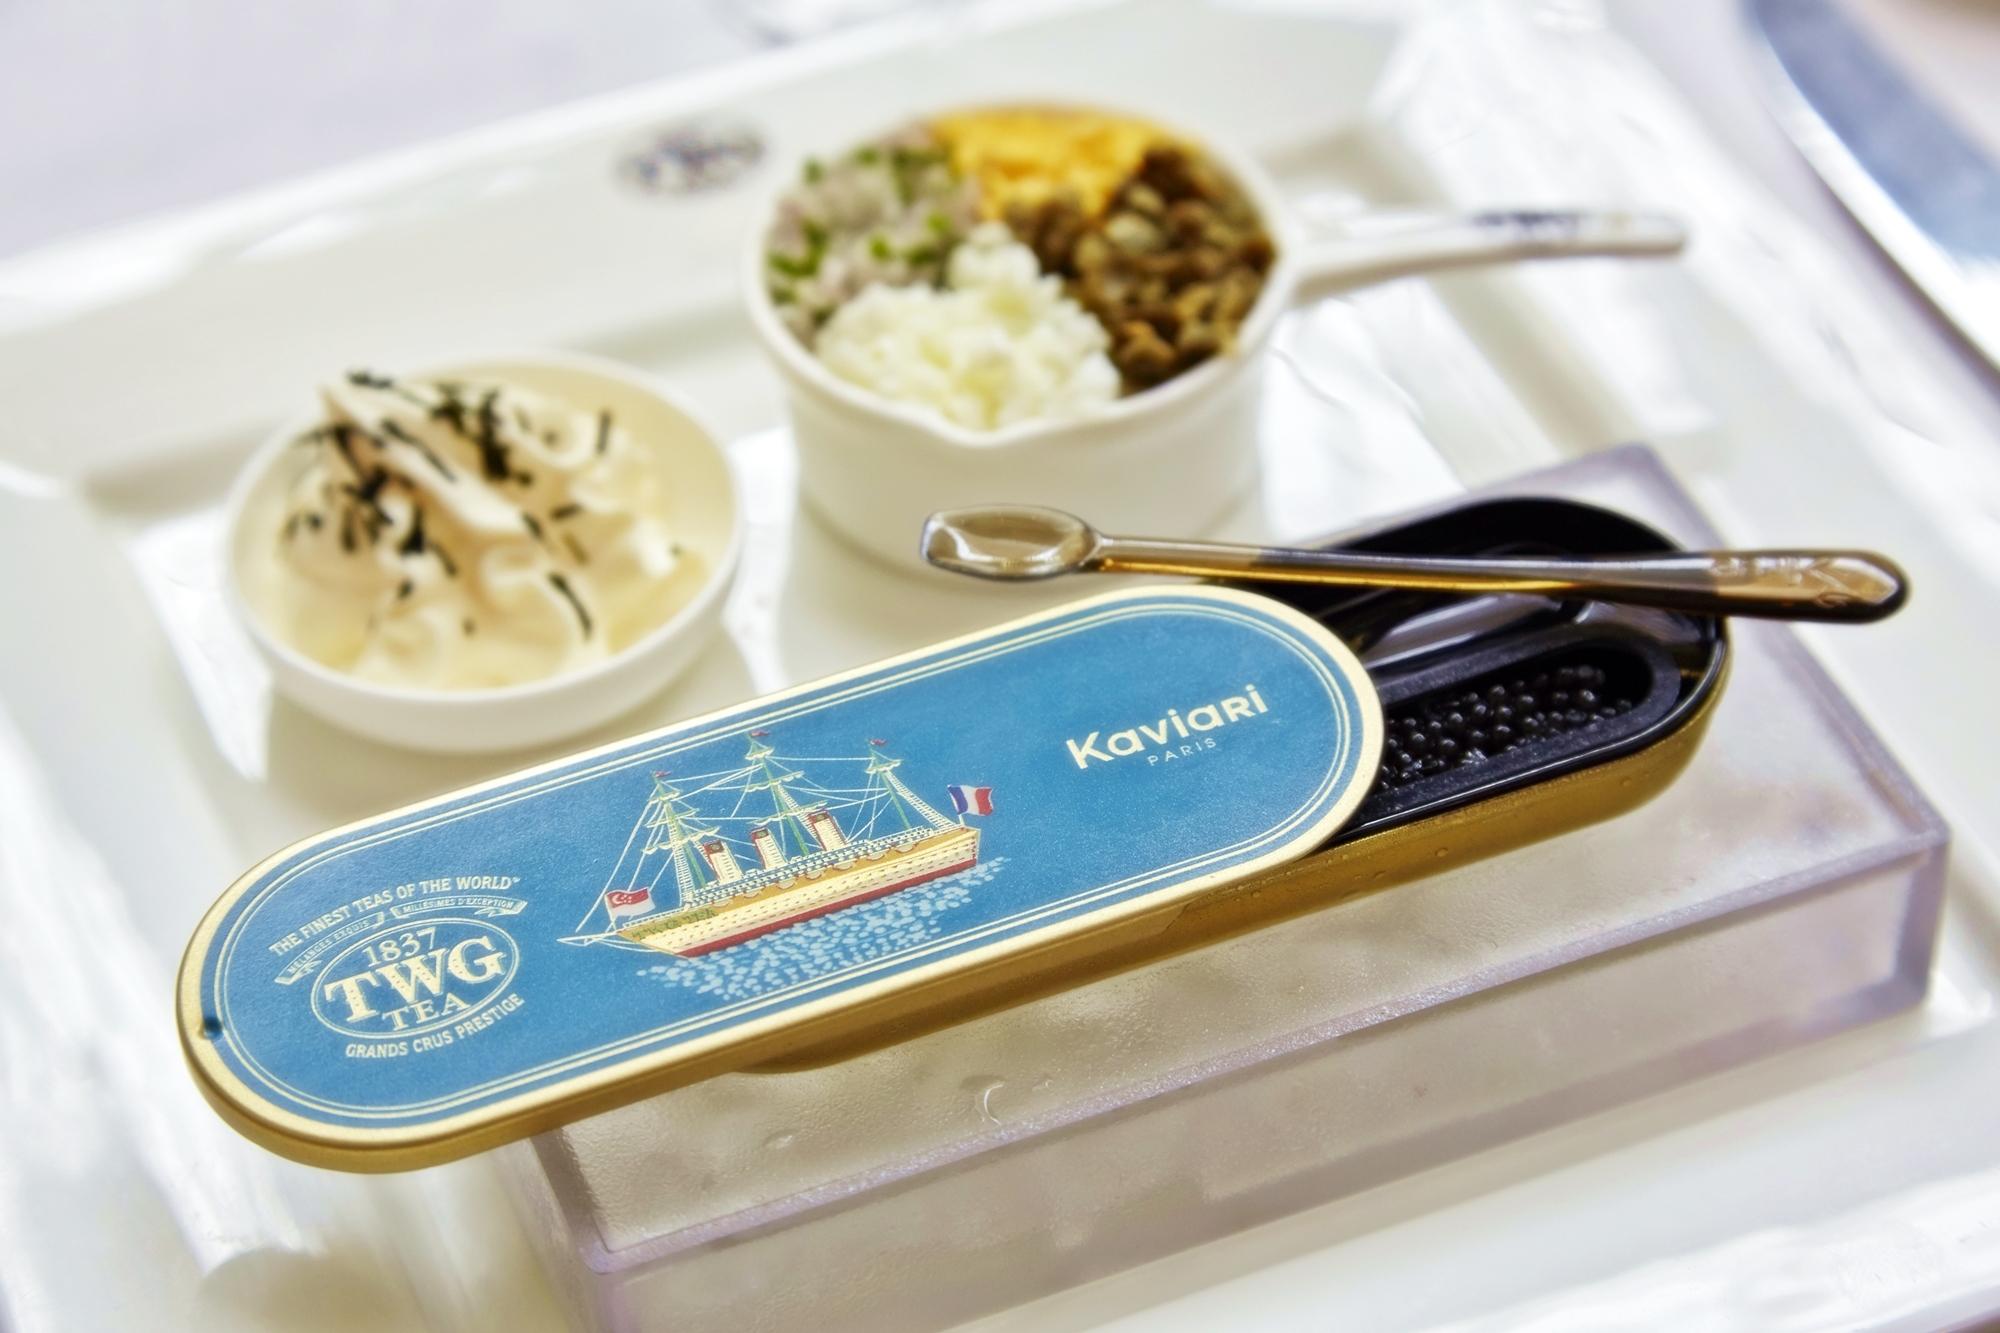 Keep Calm and Caviar On: TWG Tea Now Offers Caviar On The Menu